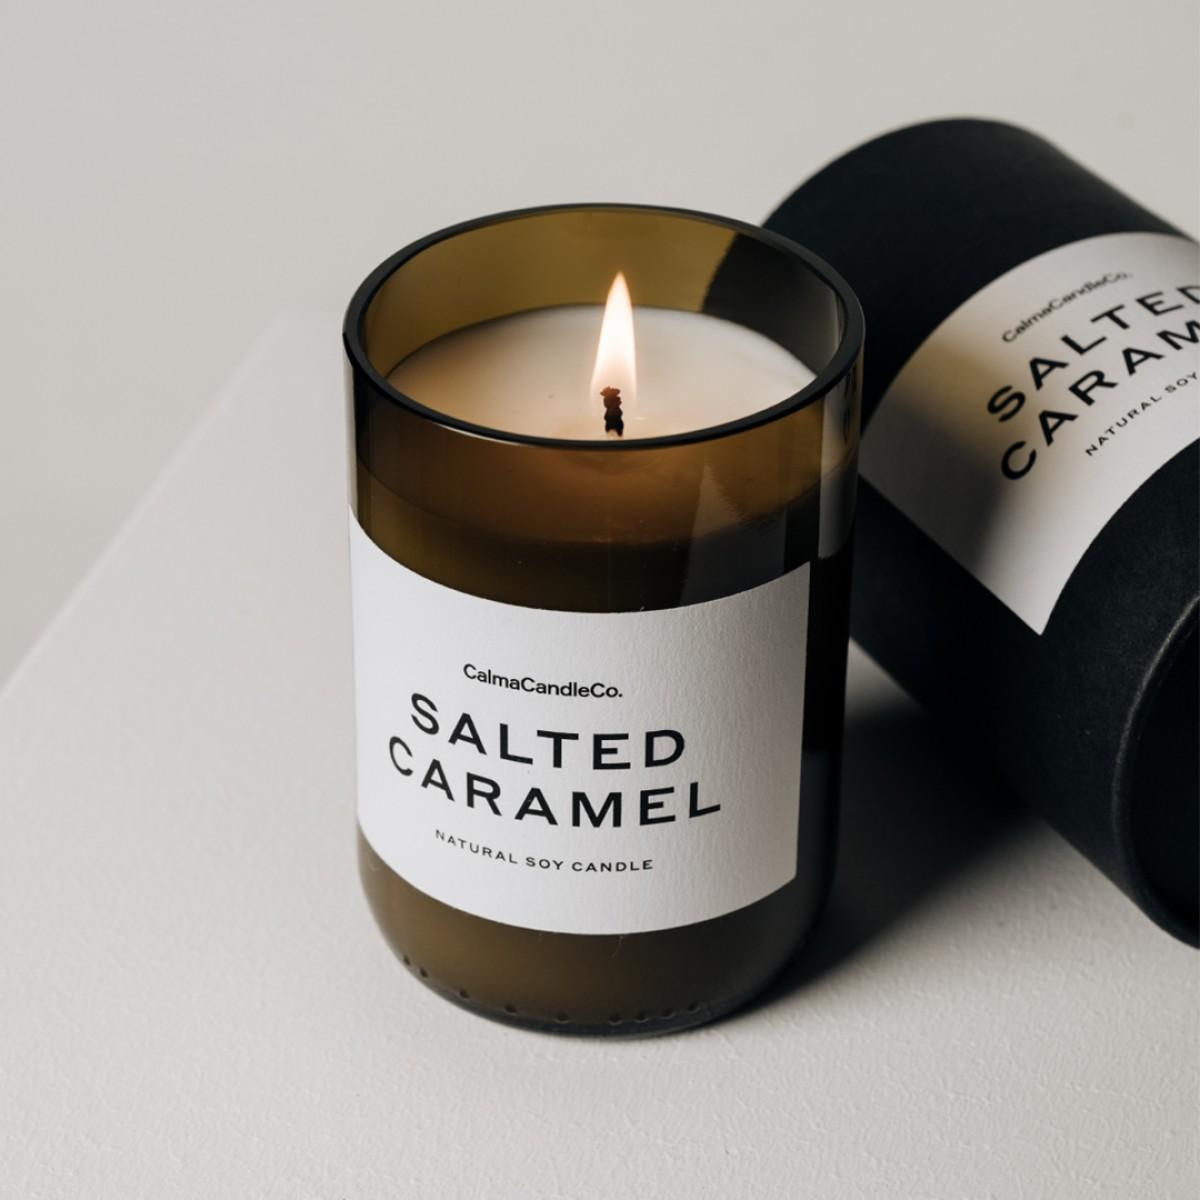 Calma Candle Co. Duftkerze Salted Caramel